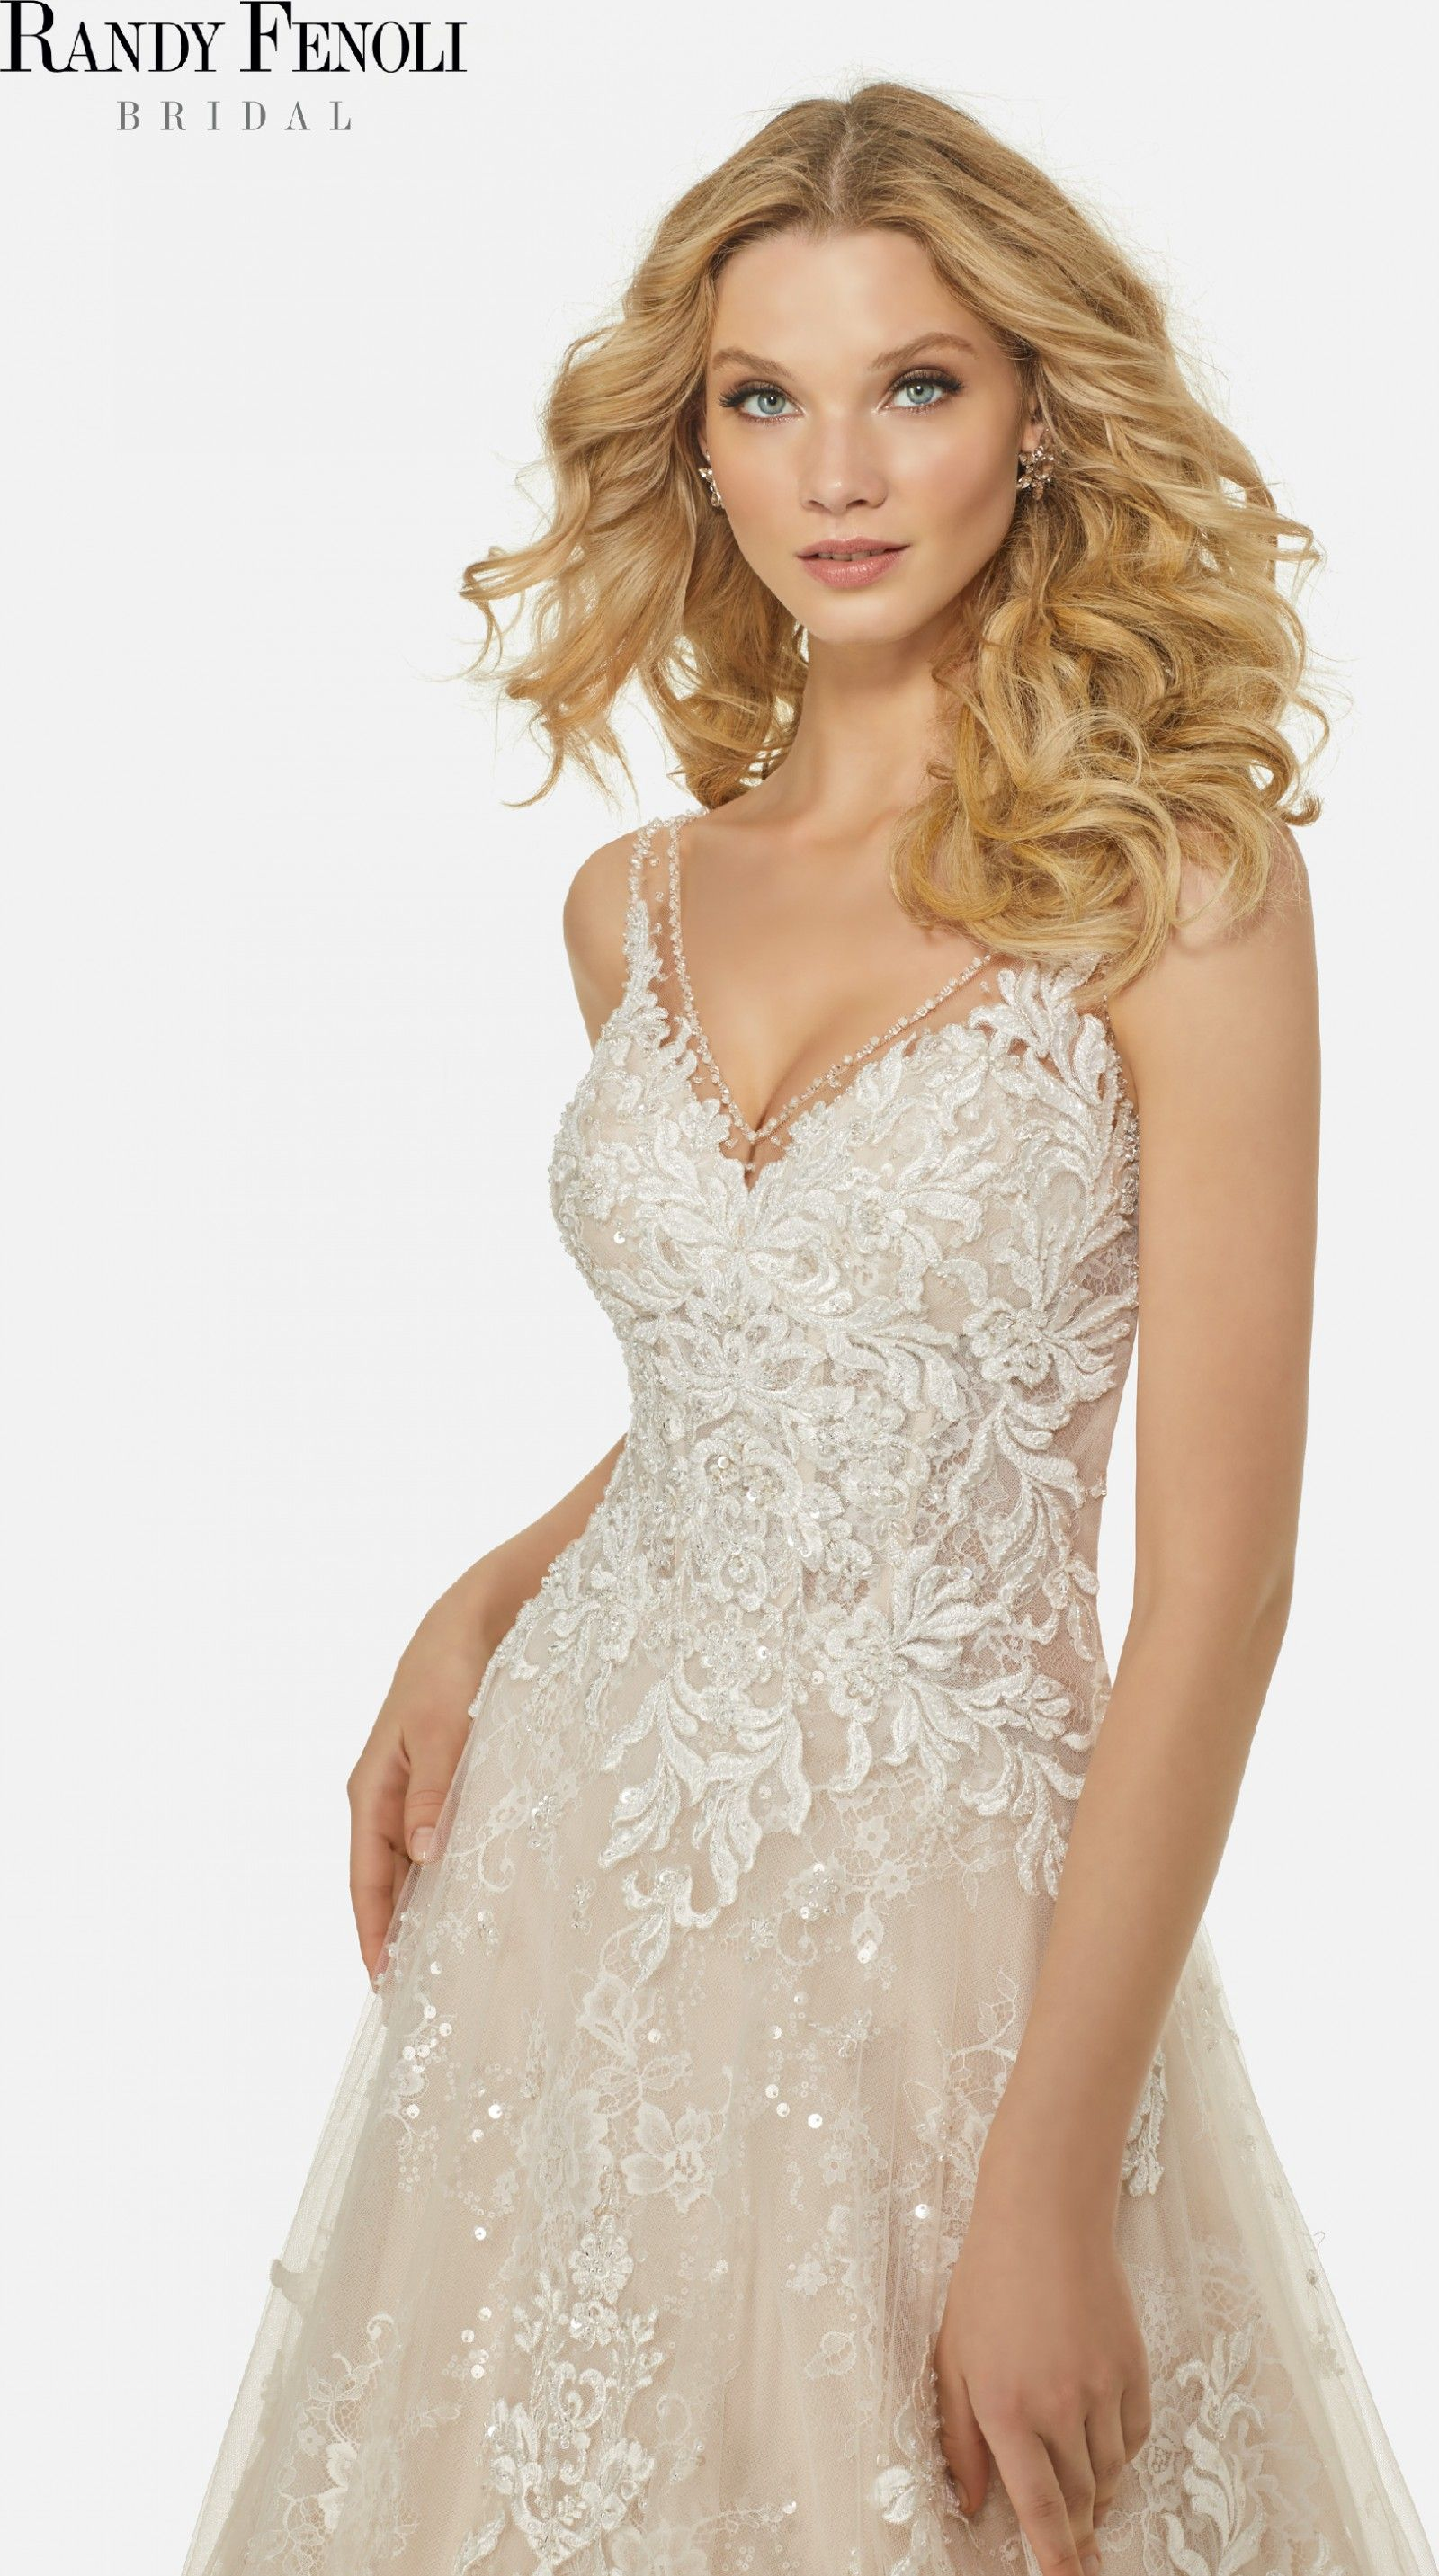 Randy Fenoli Wedding Dress Bridal Pinterest Wedding Dresses